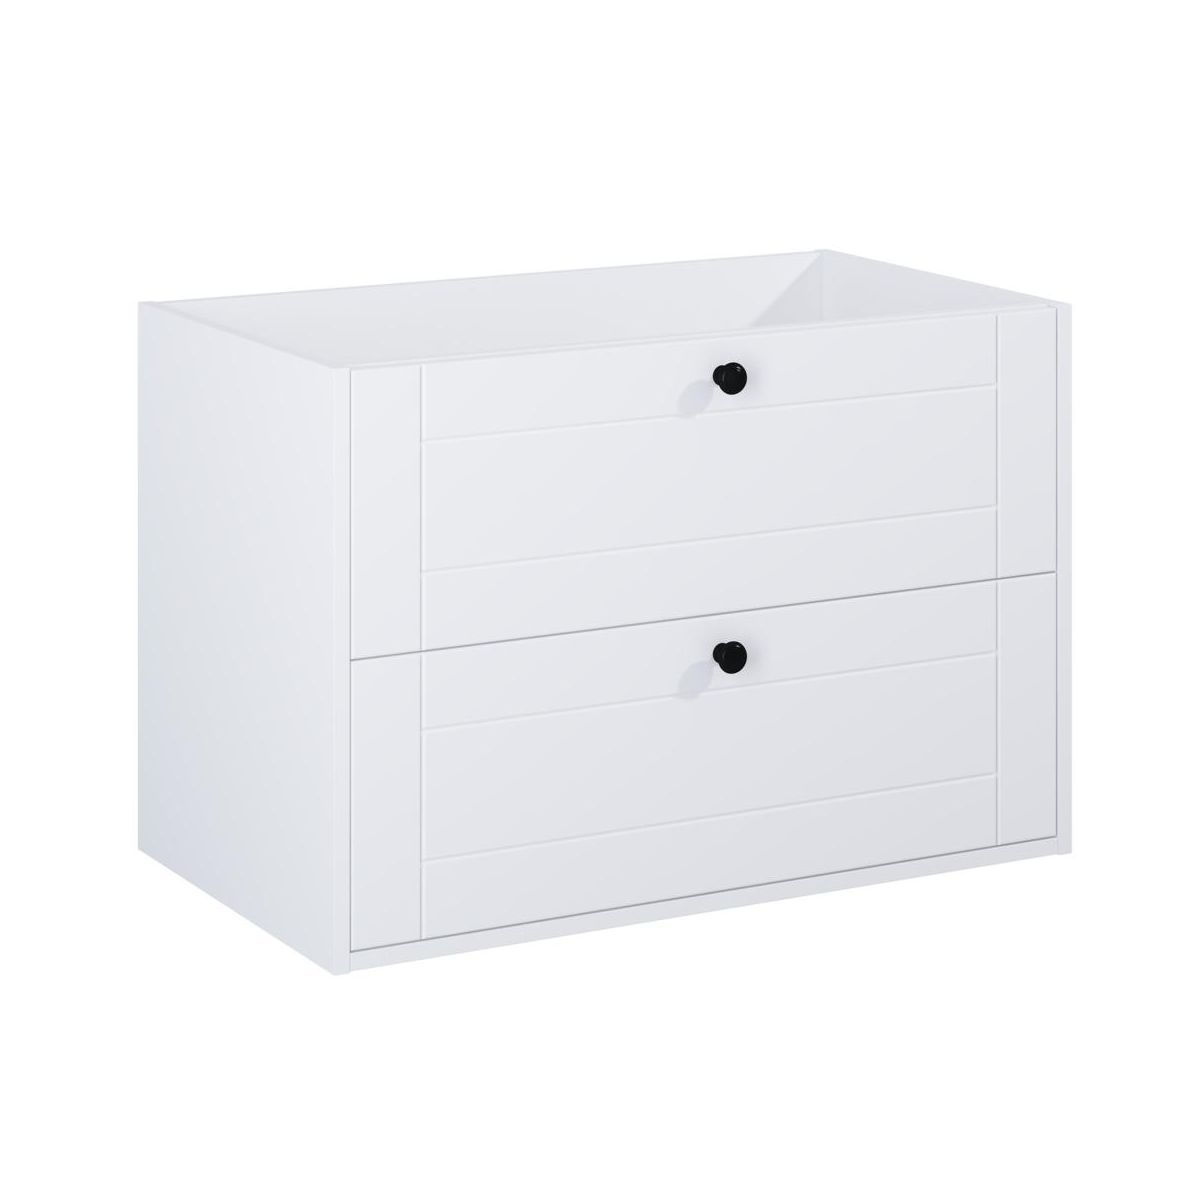 Szafka Pod Umywalke Kinga Sensea Furniture Filing Cabinet Cabinet